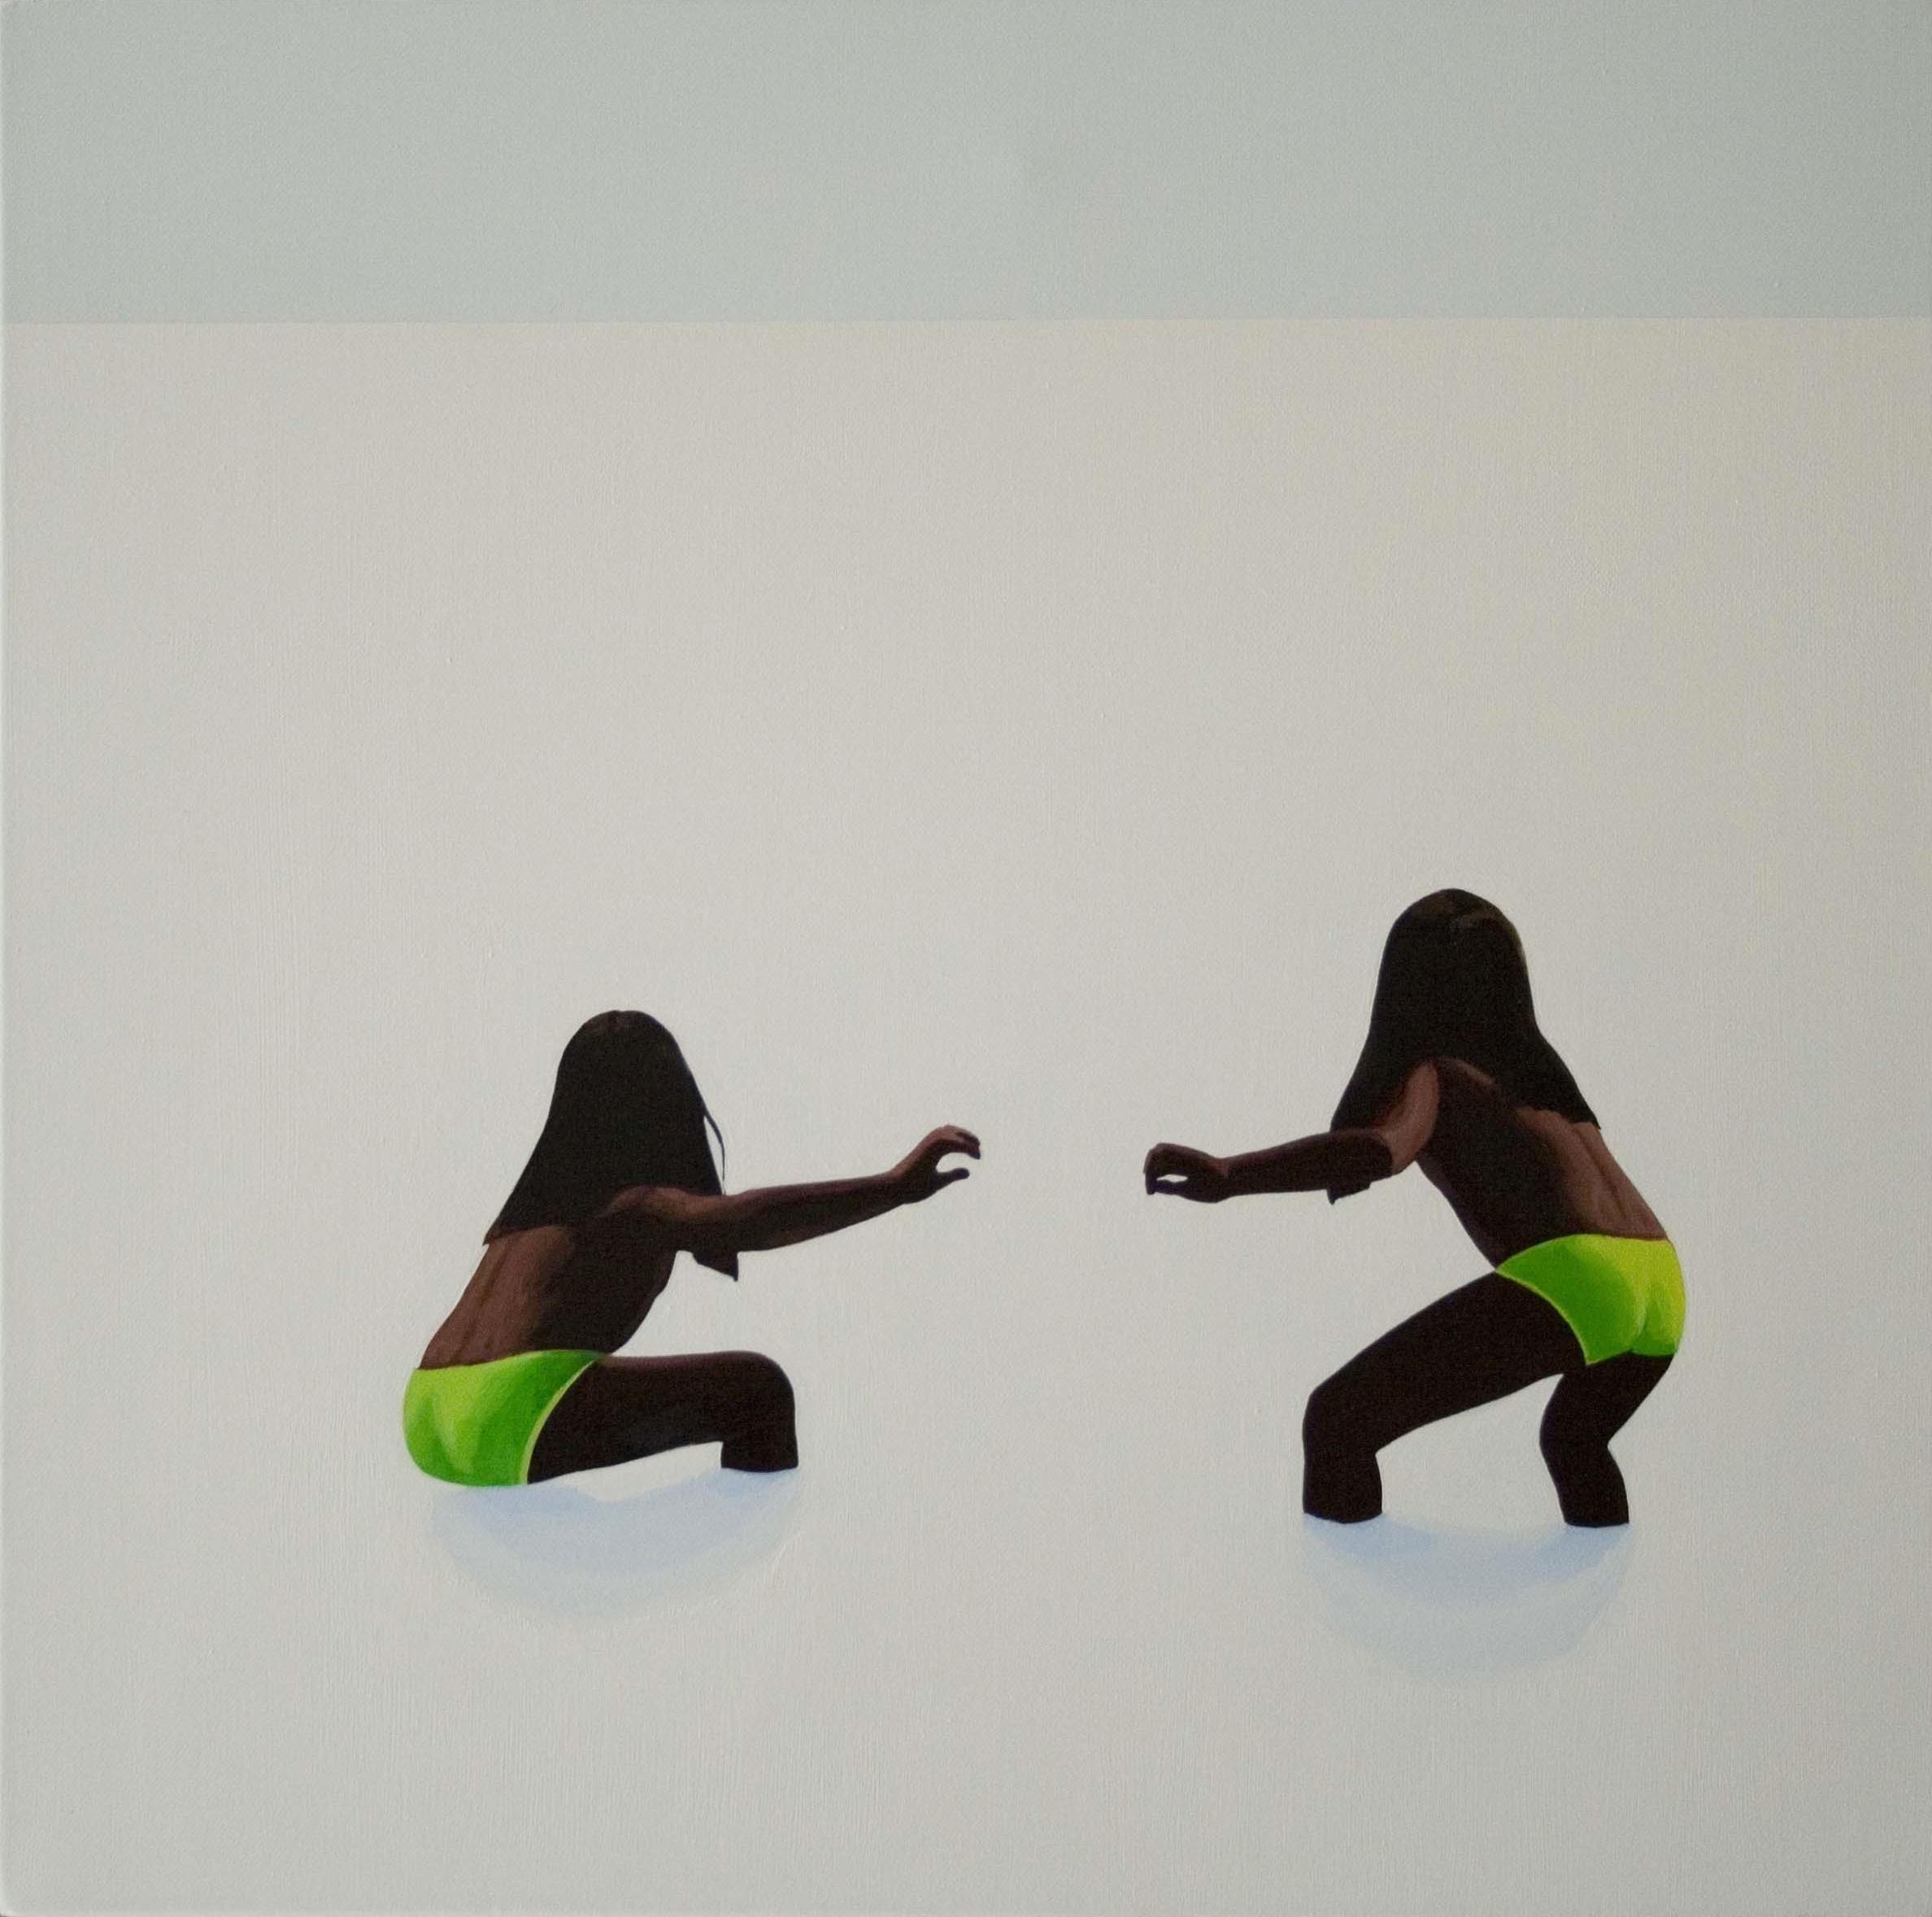 Gestures XVI - Contemporary Figurative Oil Painting, Landscape, Beach View